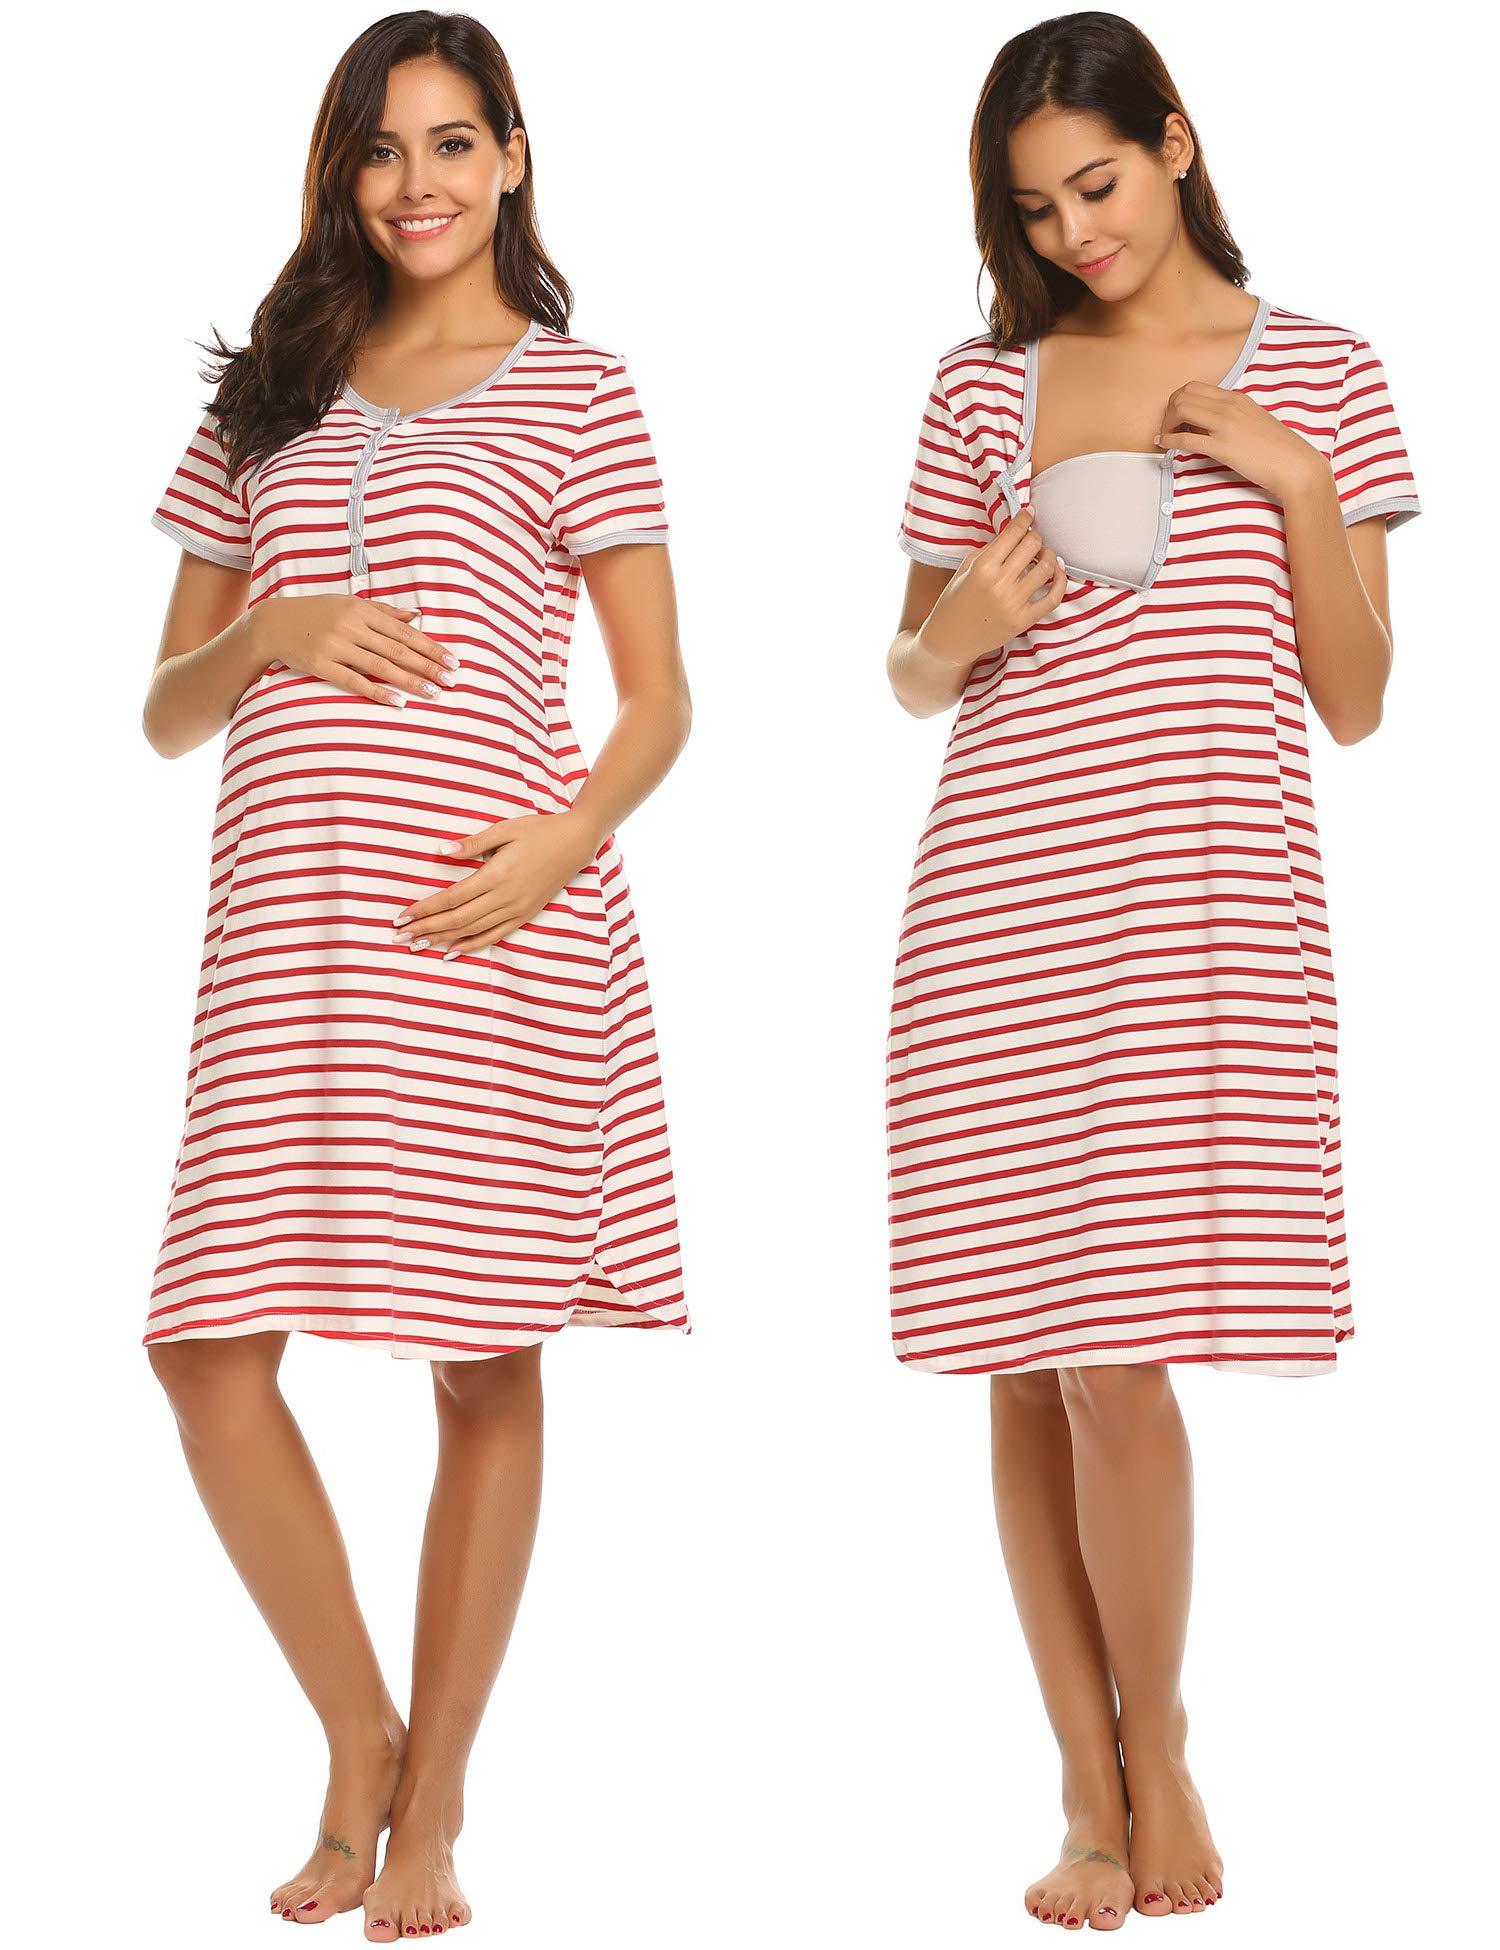 Lusofie Nursing Nightgown Womens Short Sleeve Maternity Dress Breastfeeding Sleepwear